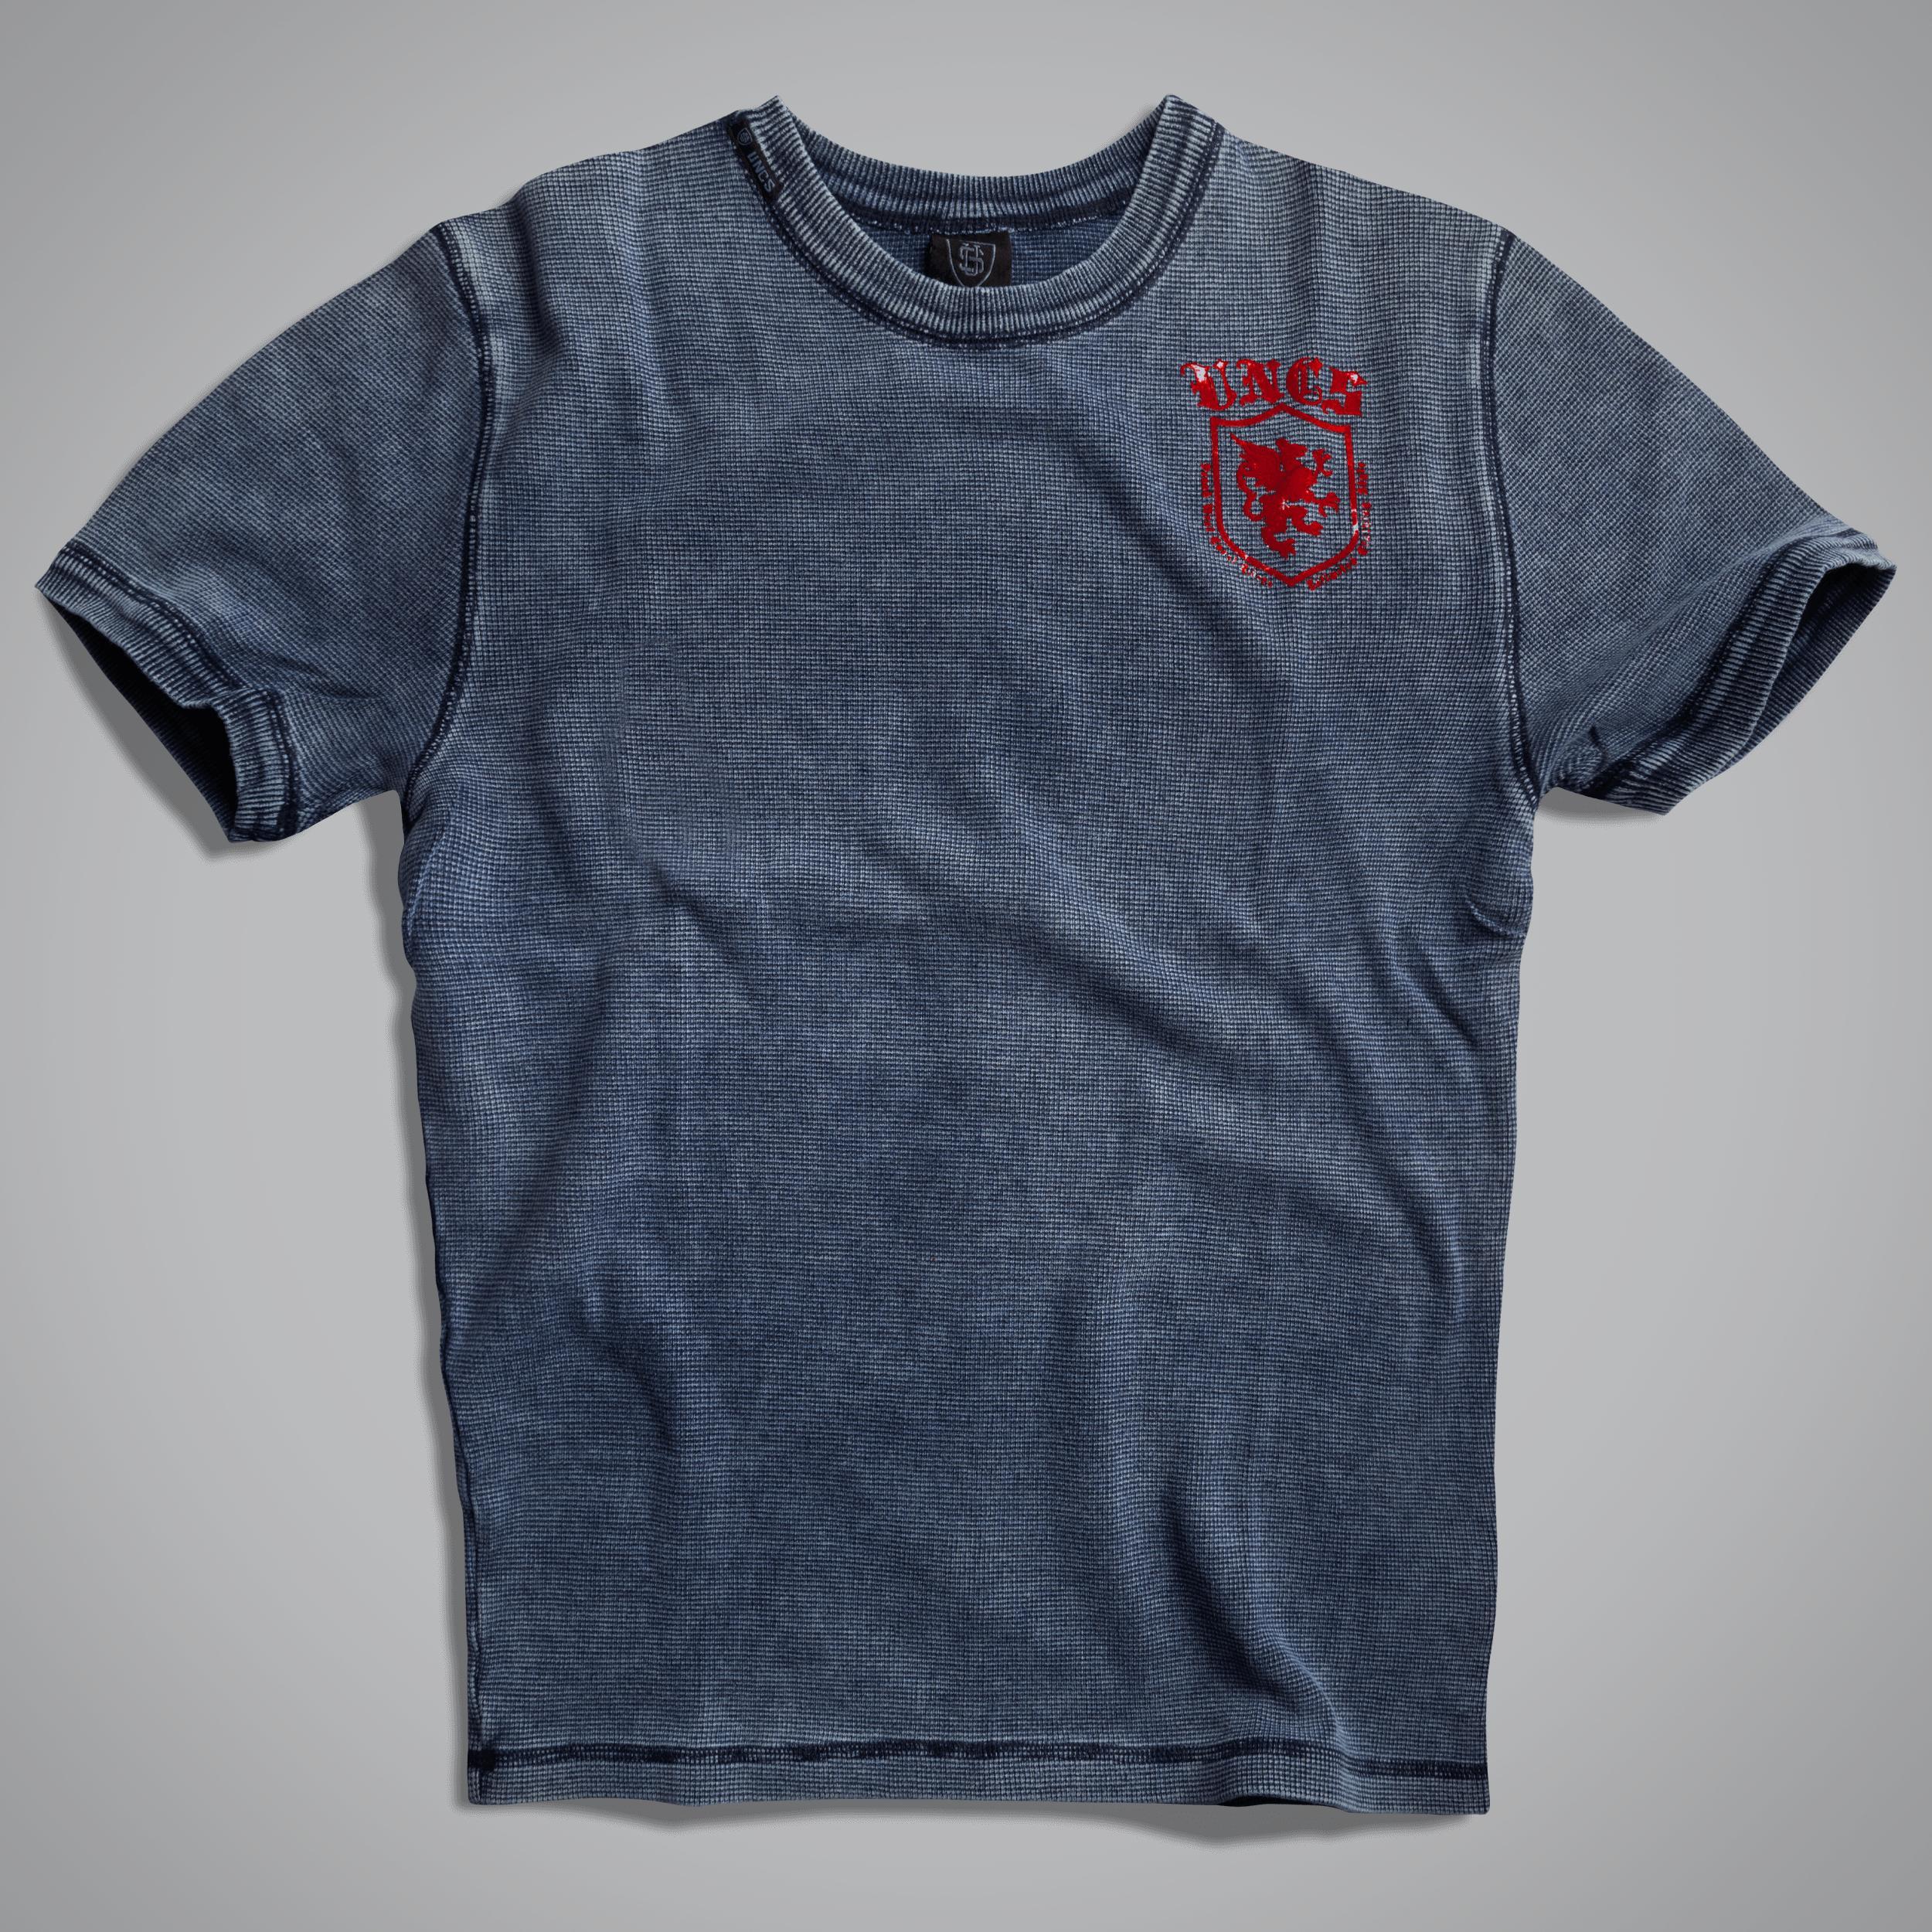 Pánské triko Dragon Vaffle - Pánská trička 7e4906d6f8